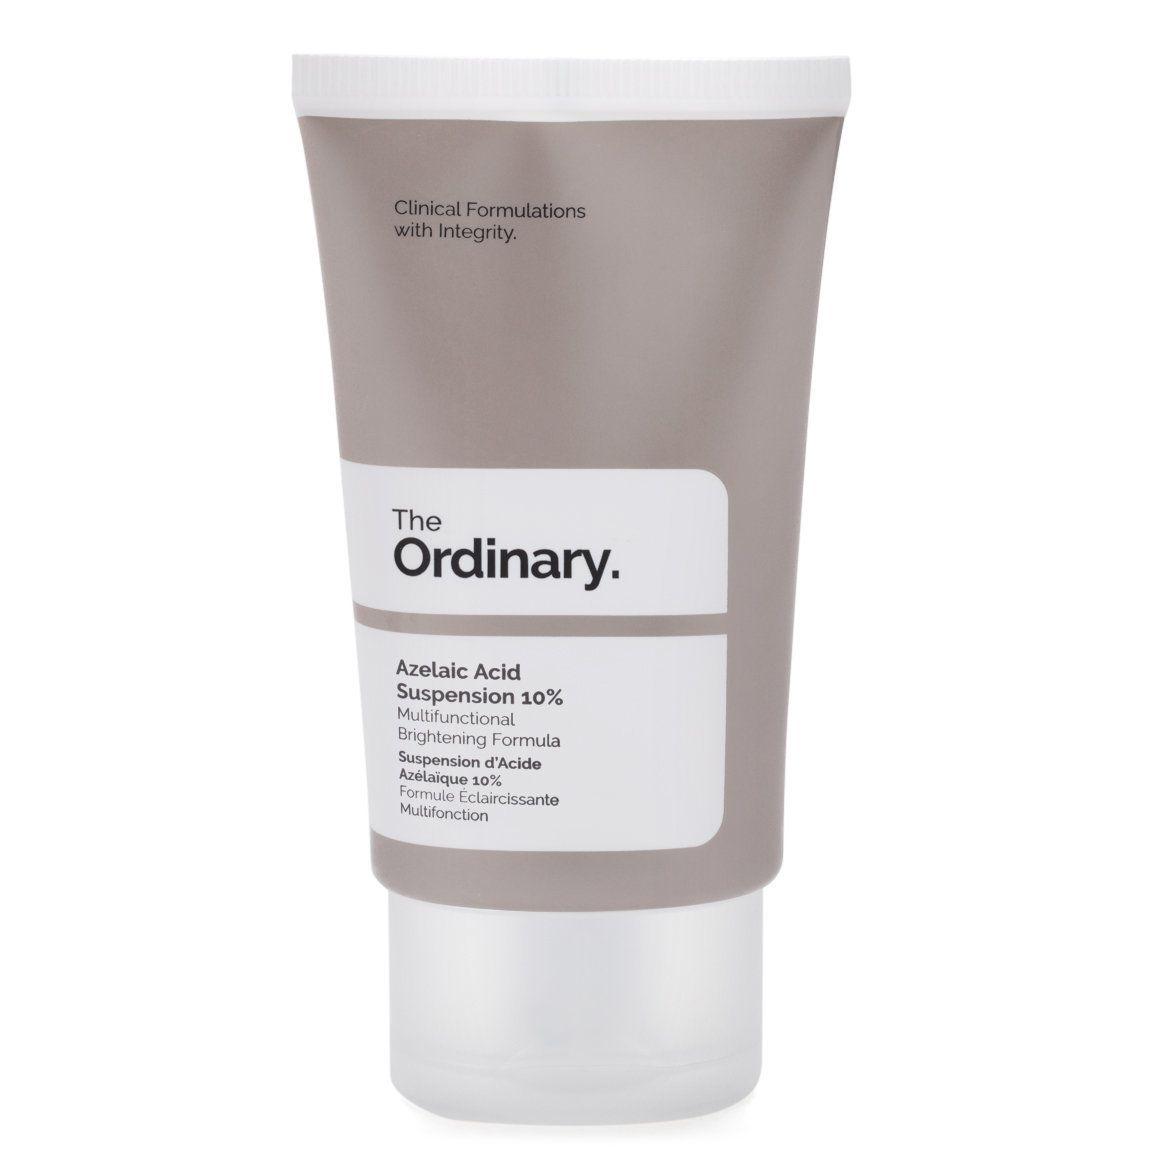 The ordinary ácido azeláico suspension 10% 30ml